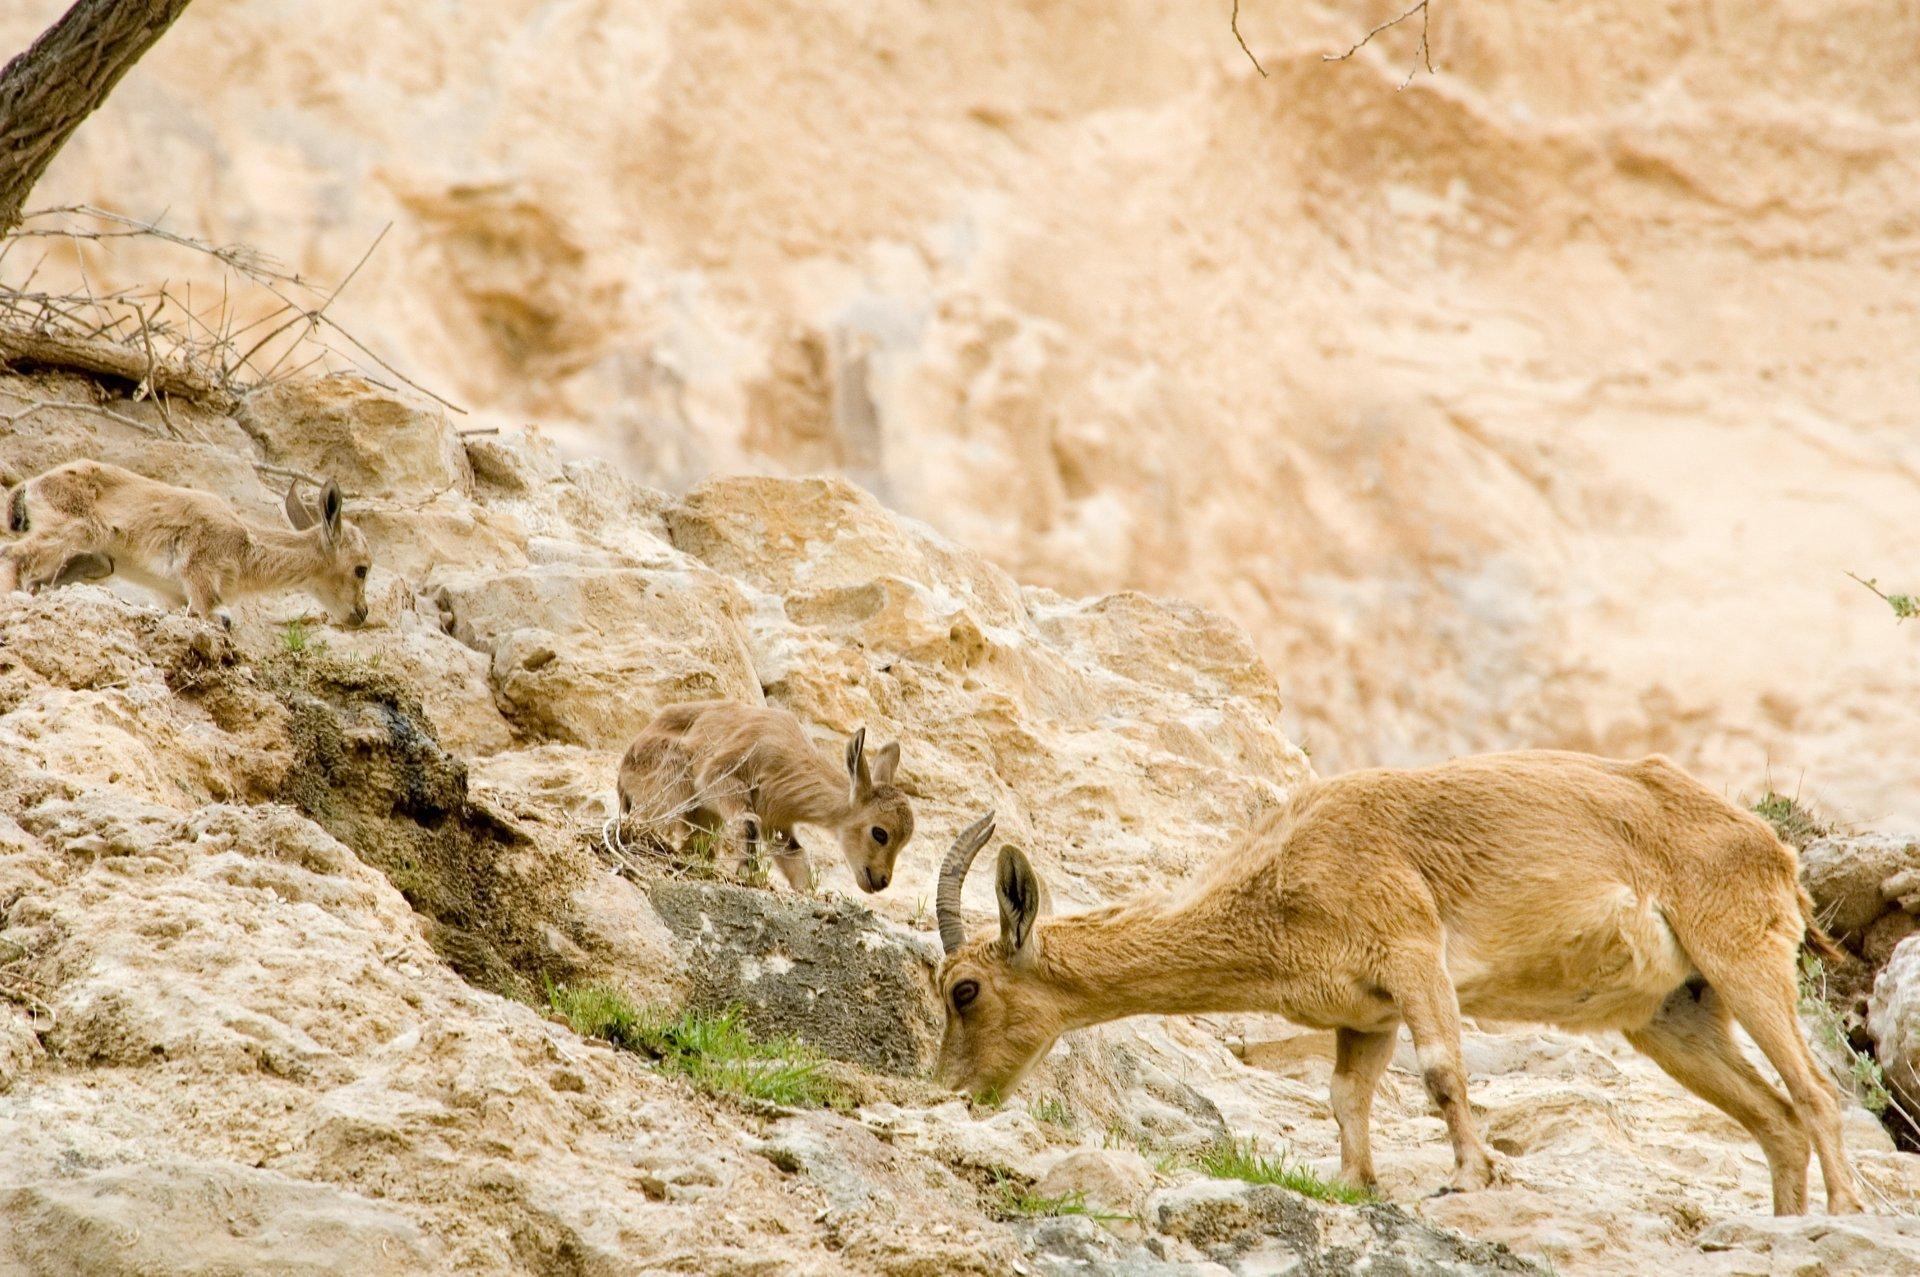 Nubian Ibex Baby Mountain Goats in Israel - Best Season 2020